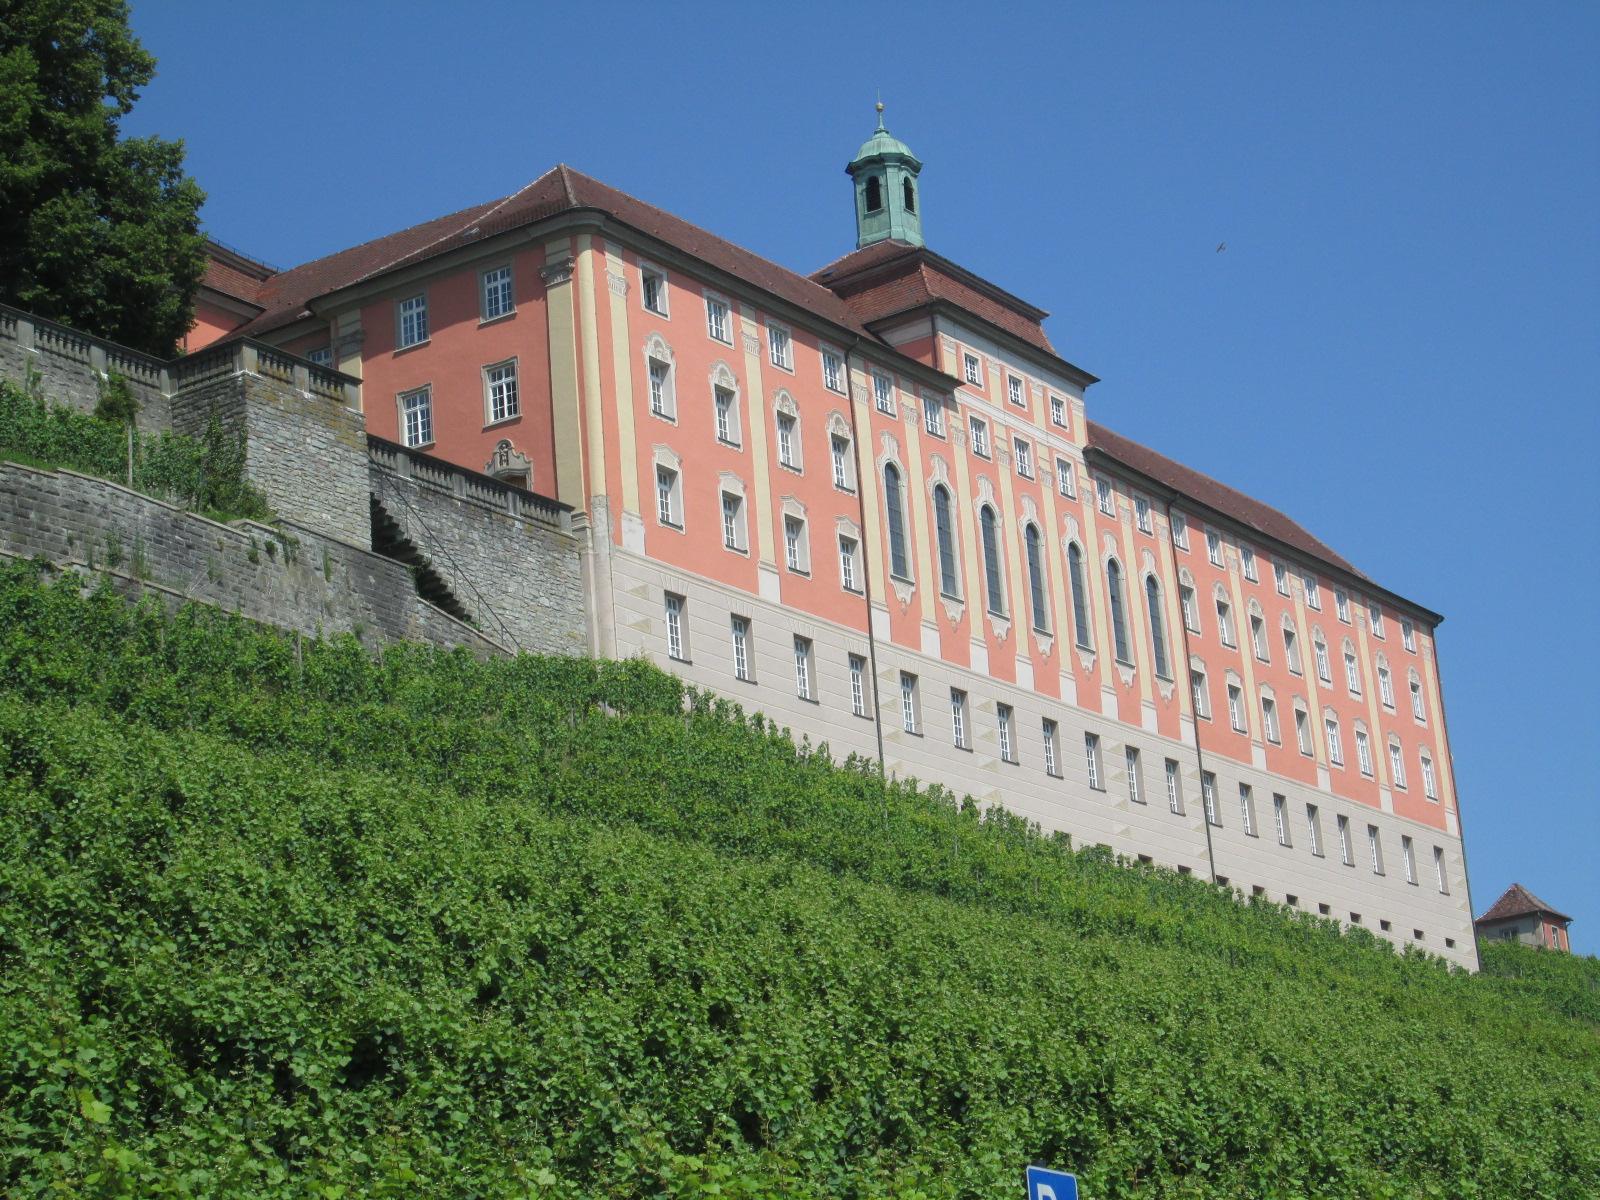 castelli e vigneti a Meersburg